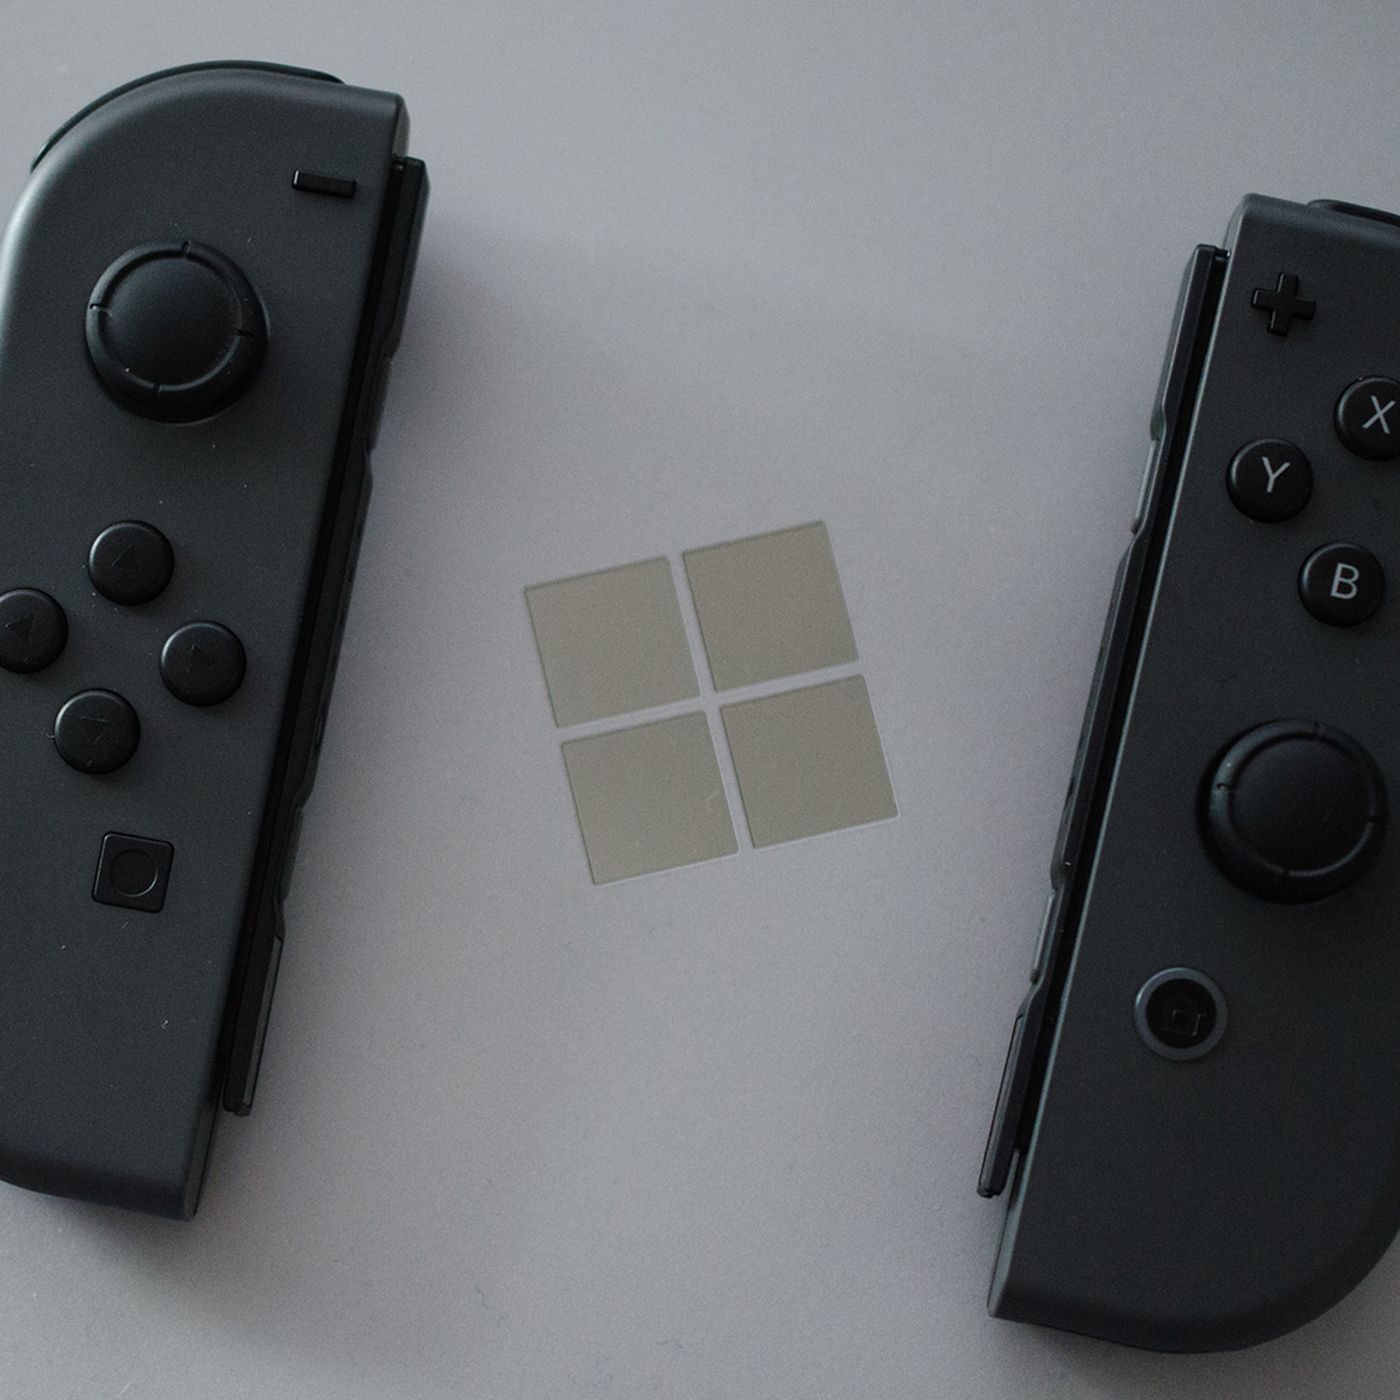 Nintendo's Joy-Con controllers also work with Windows, Mac